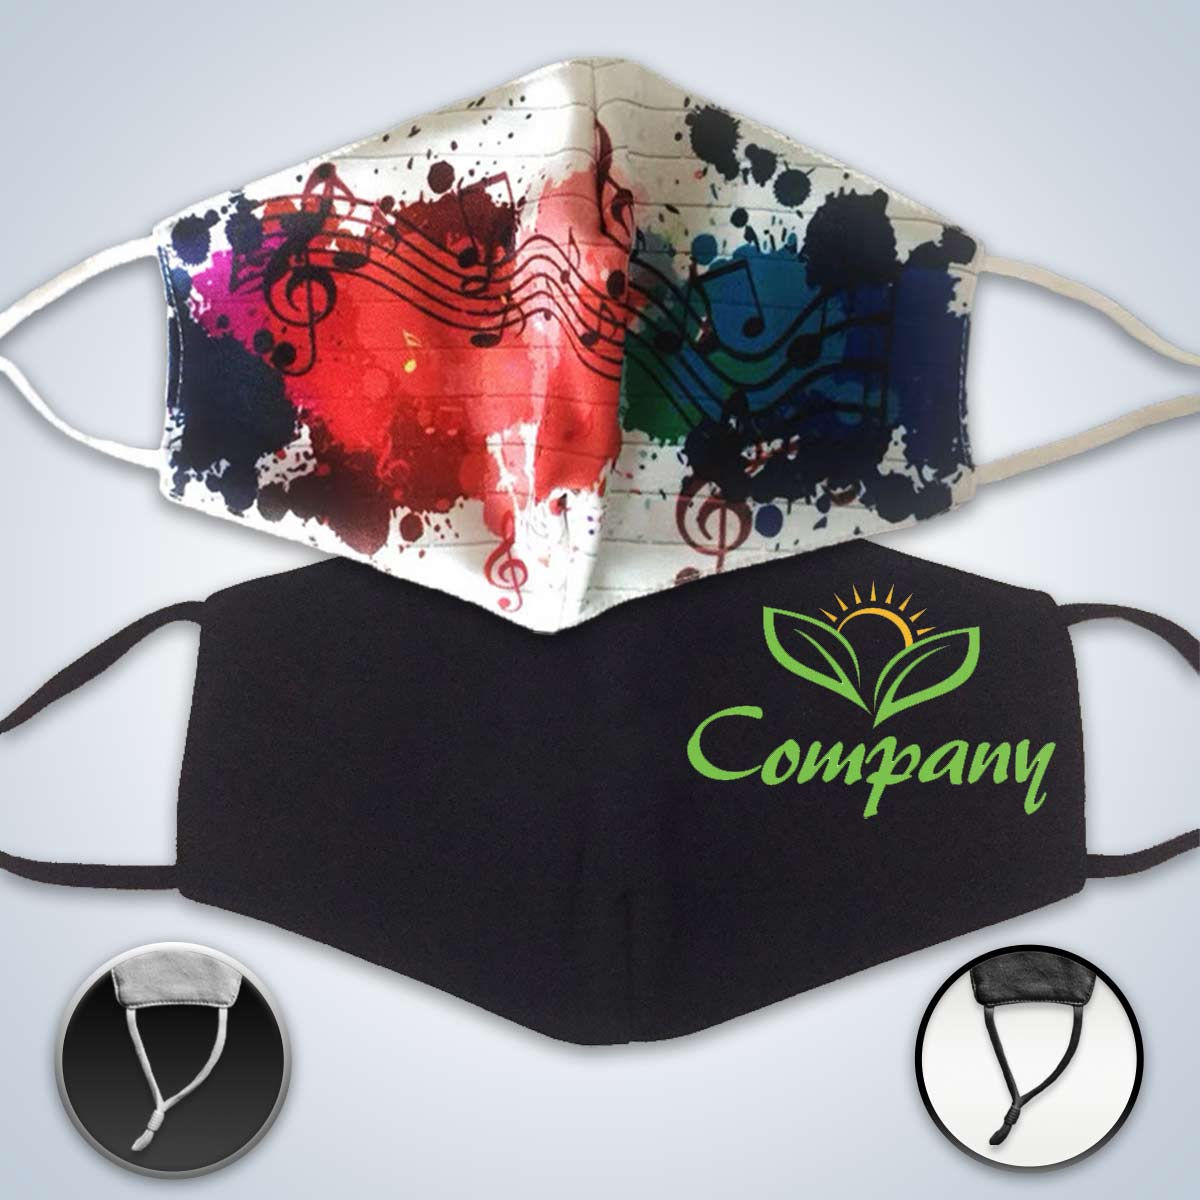 Custom Printed Masks With Adjustable Ear-loop